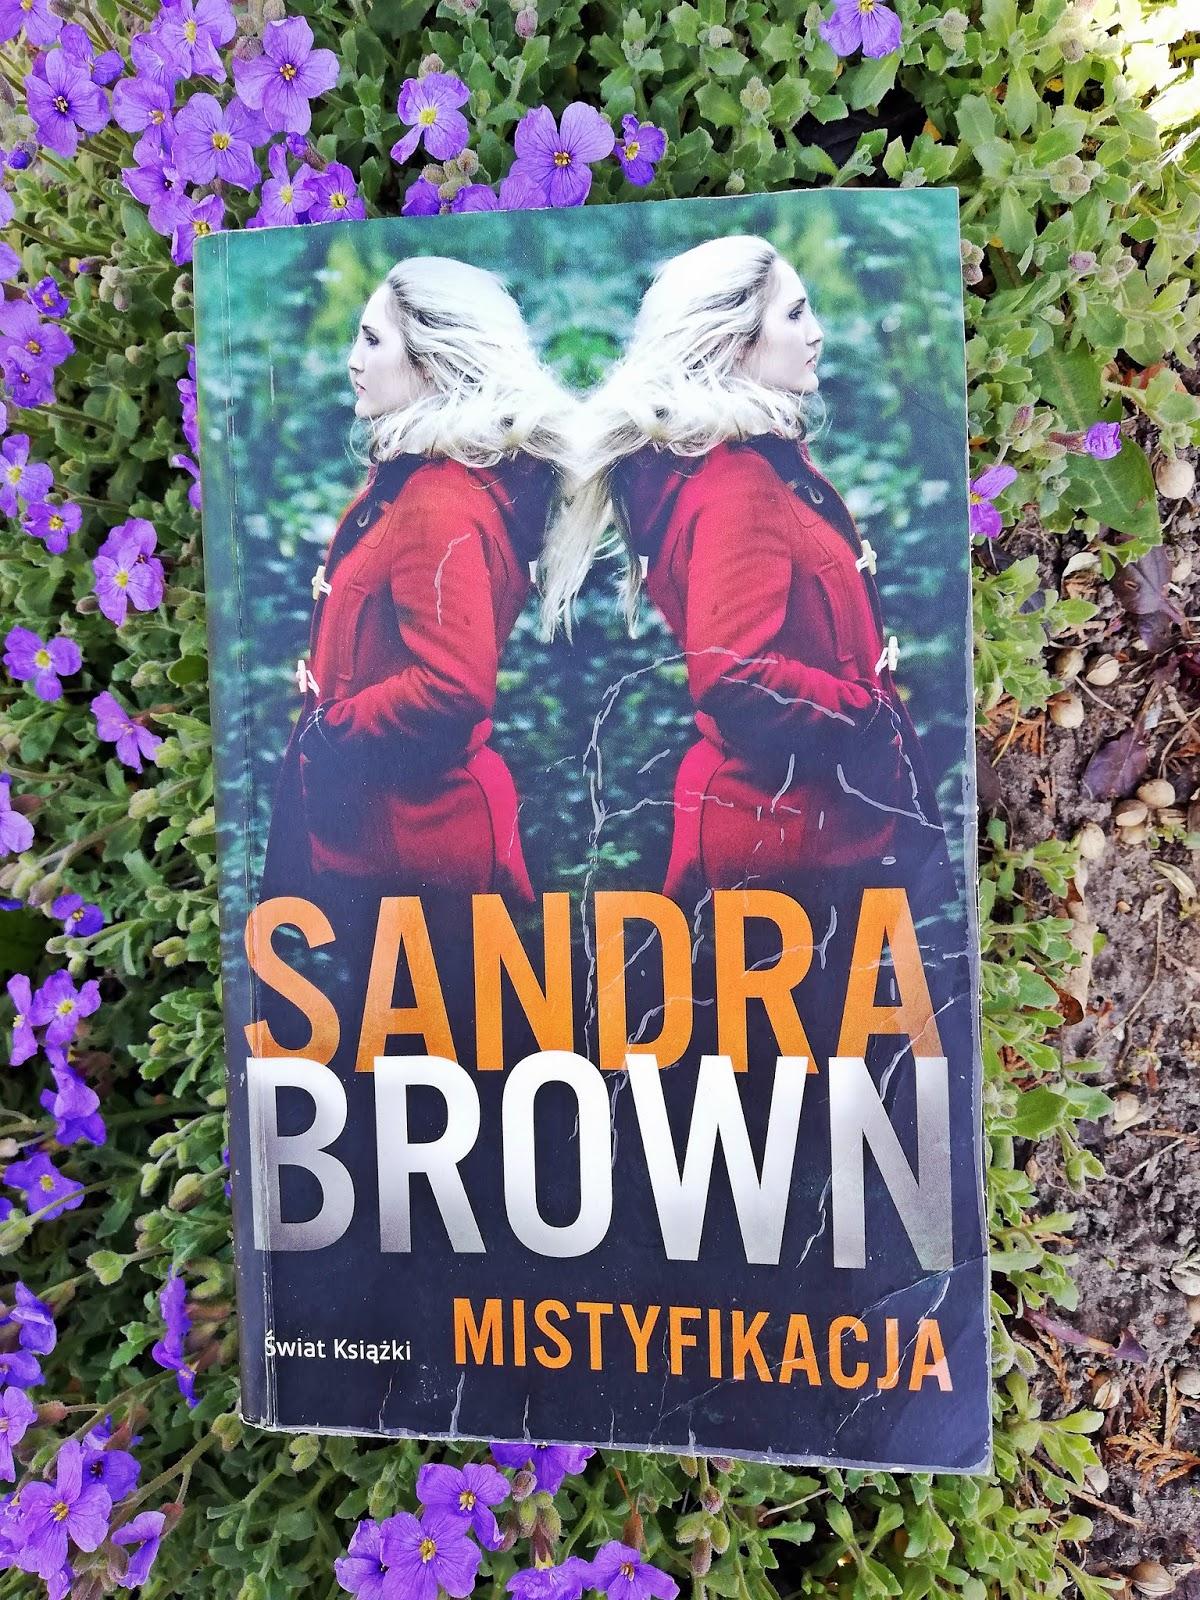 Recenzje książek: Mistyfikacja - Sandra Brown #4